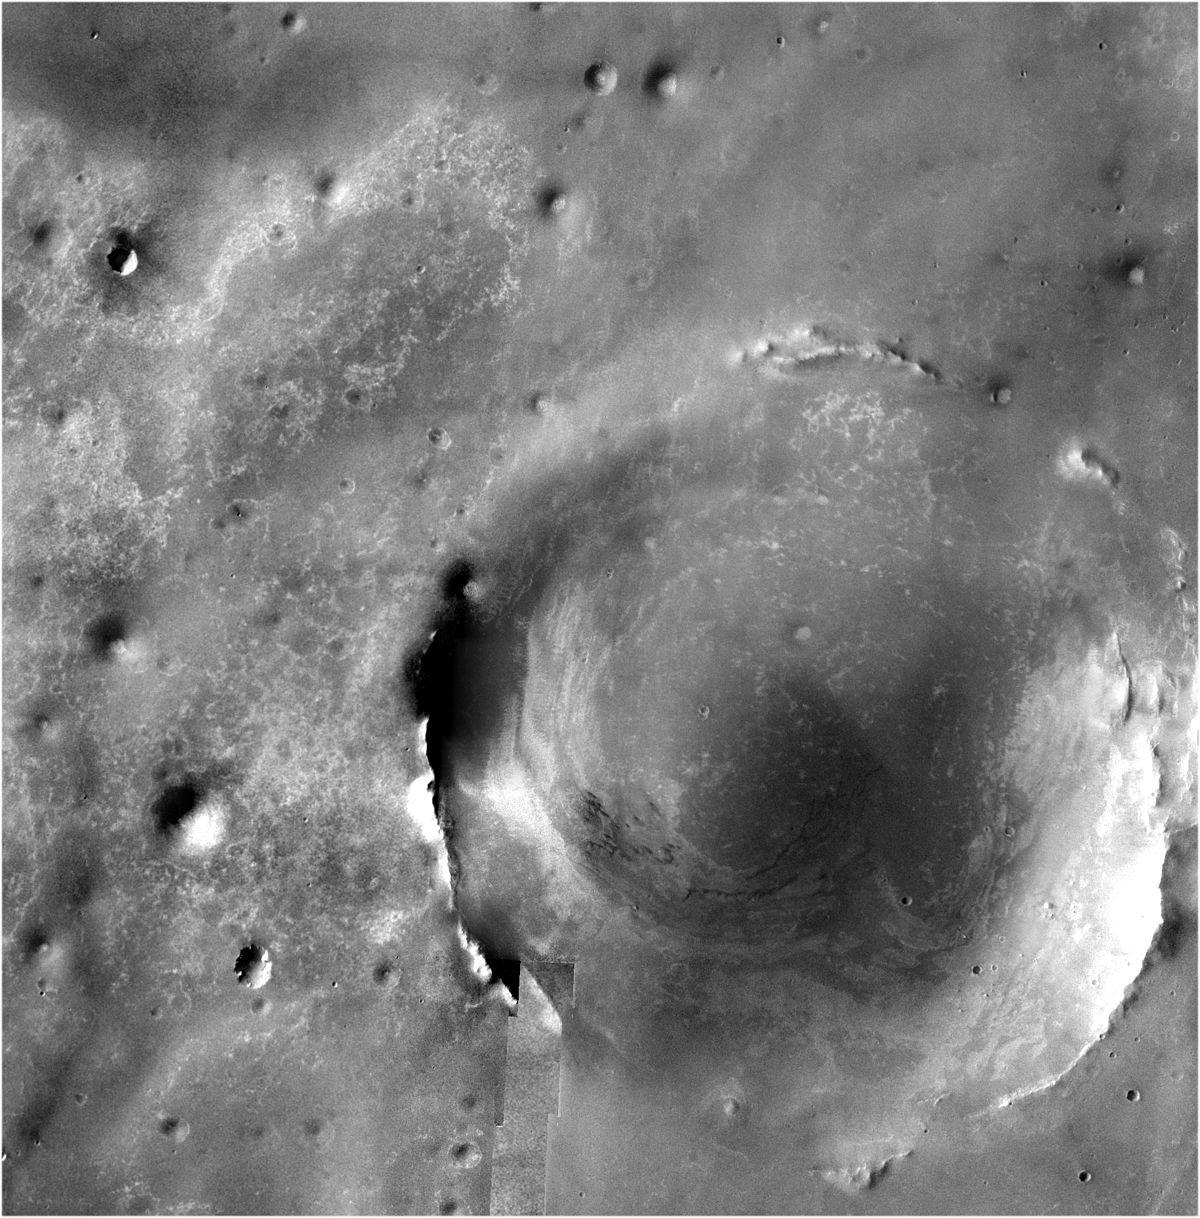 Марсоход Opportunity займется исследованием кратера Индевор